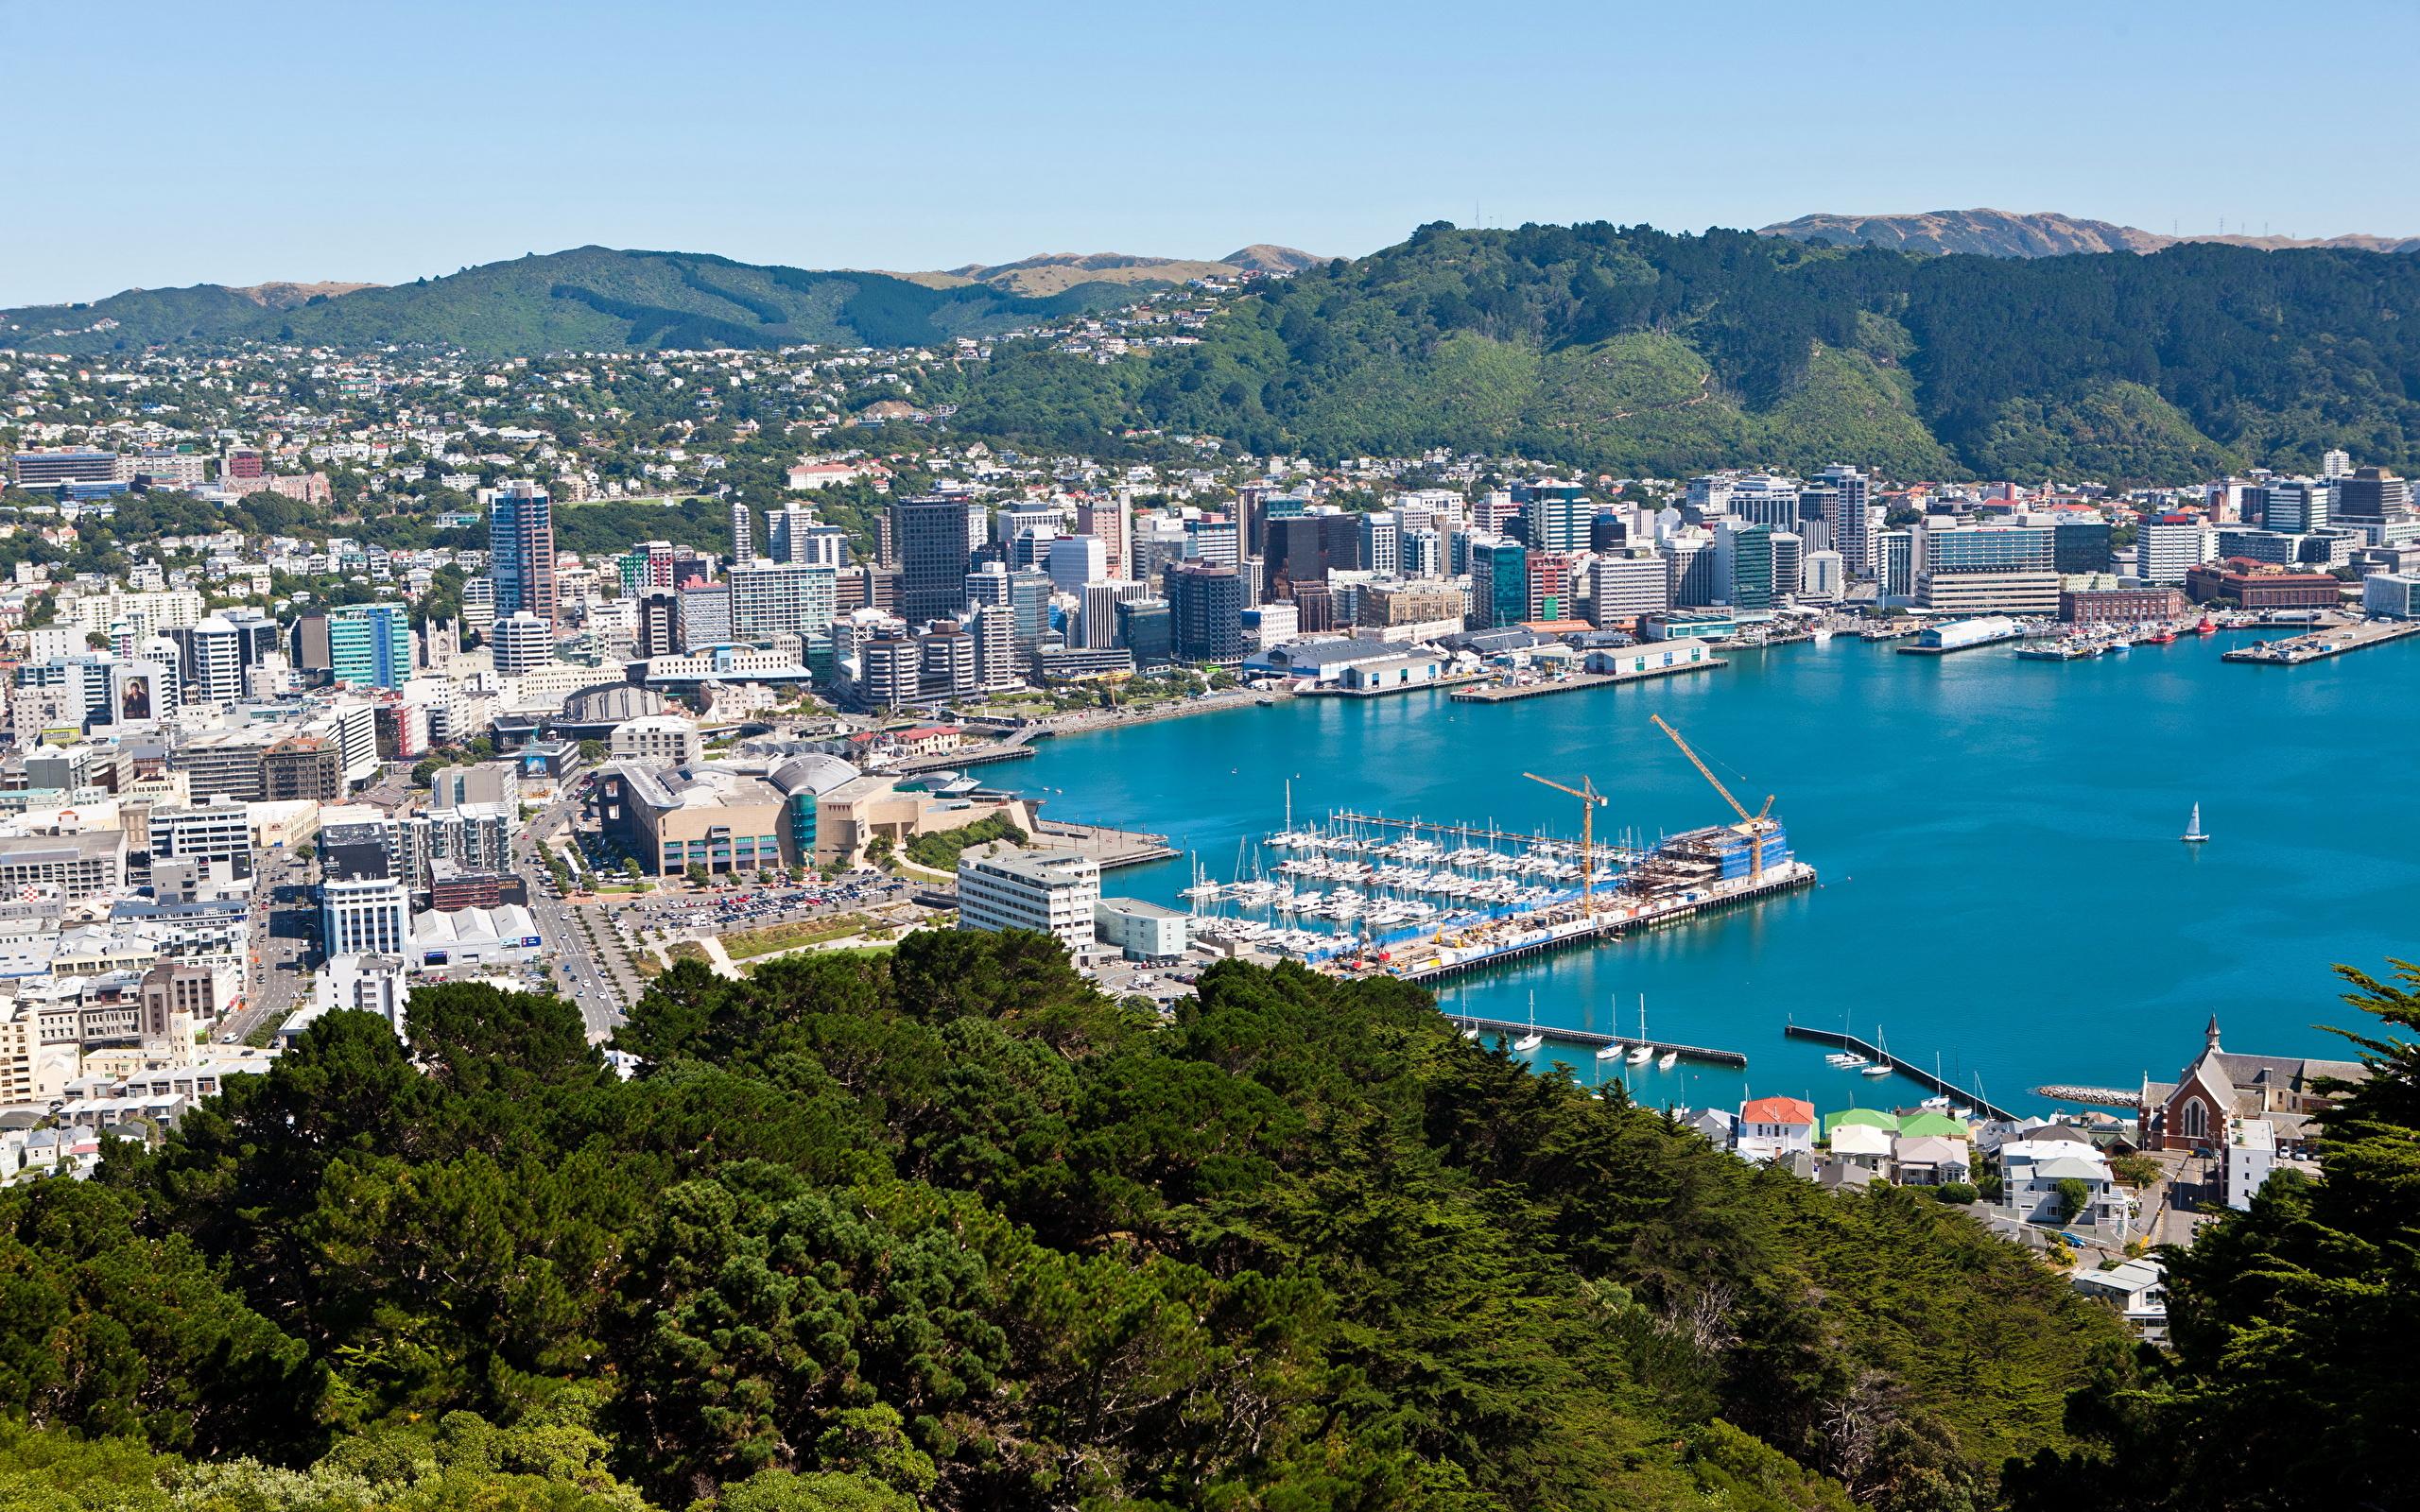 Images New Zealand Wellington Coast Marinas From above 2560x1600 2560x1600